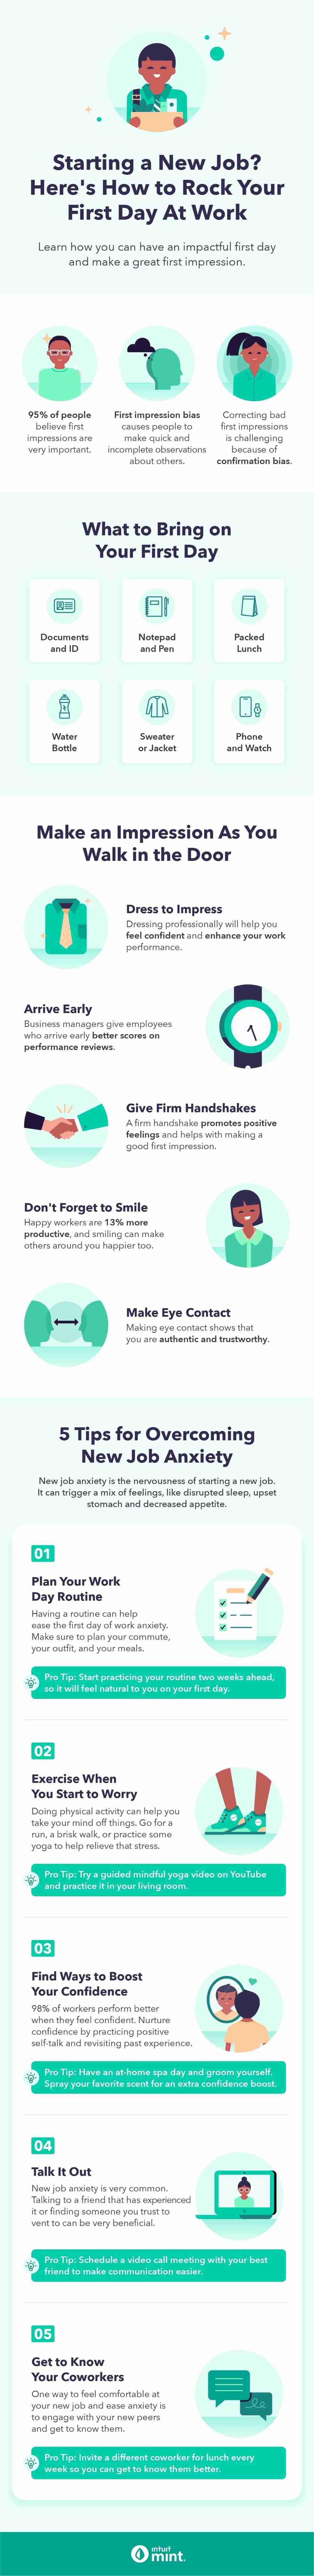 Starting a New Job Checklist